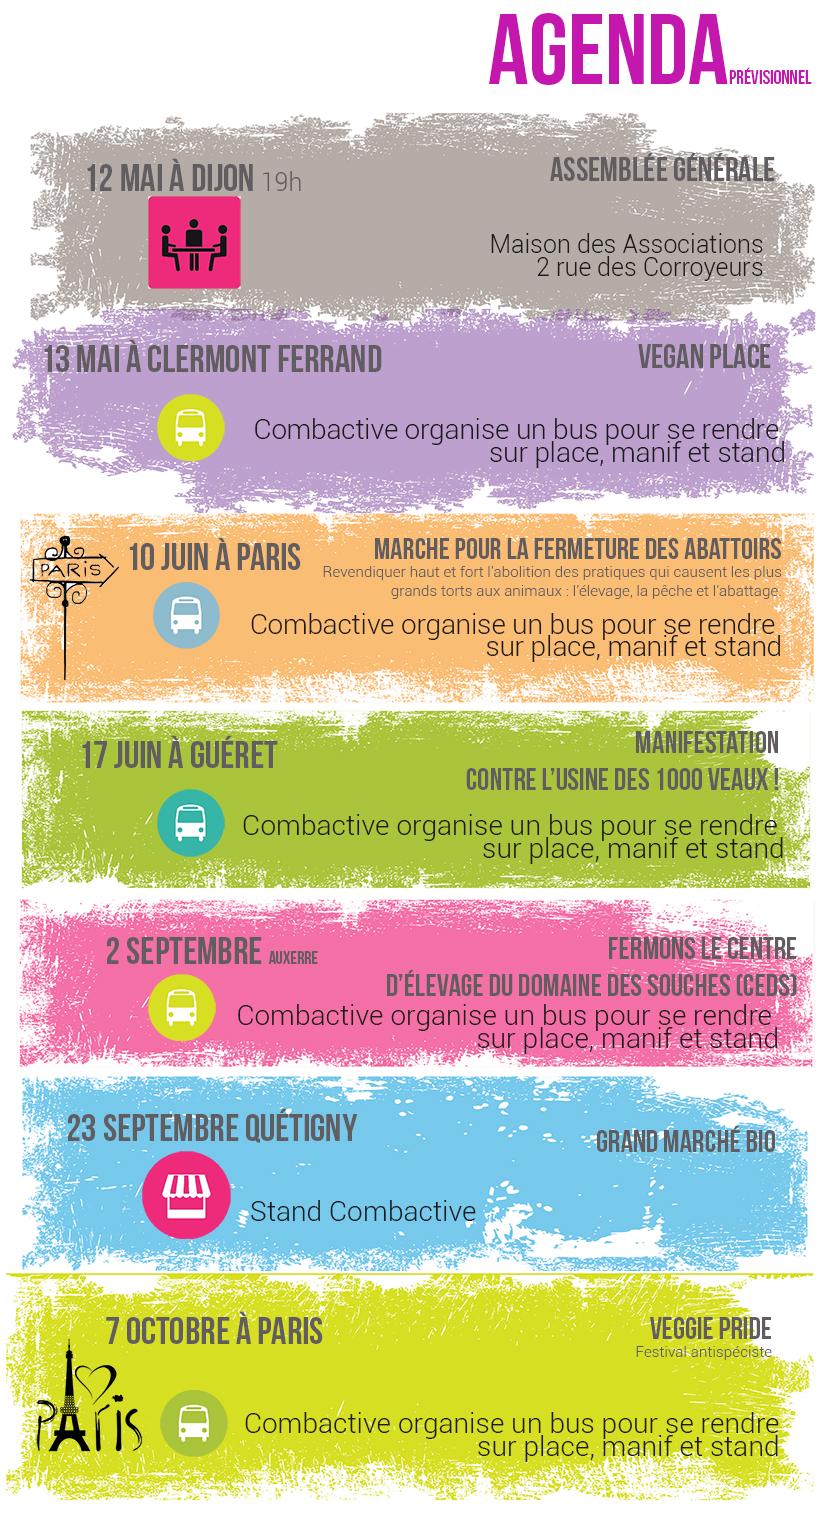 Agenda manifs de Mai à Octobre